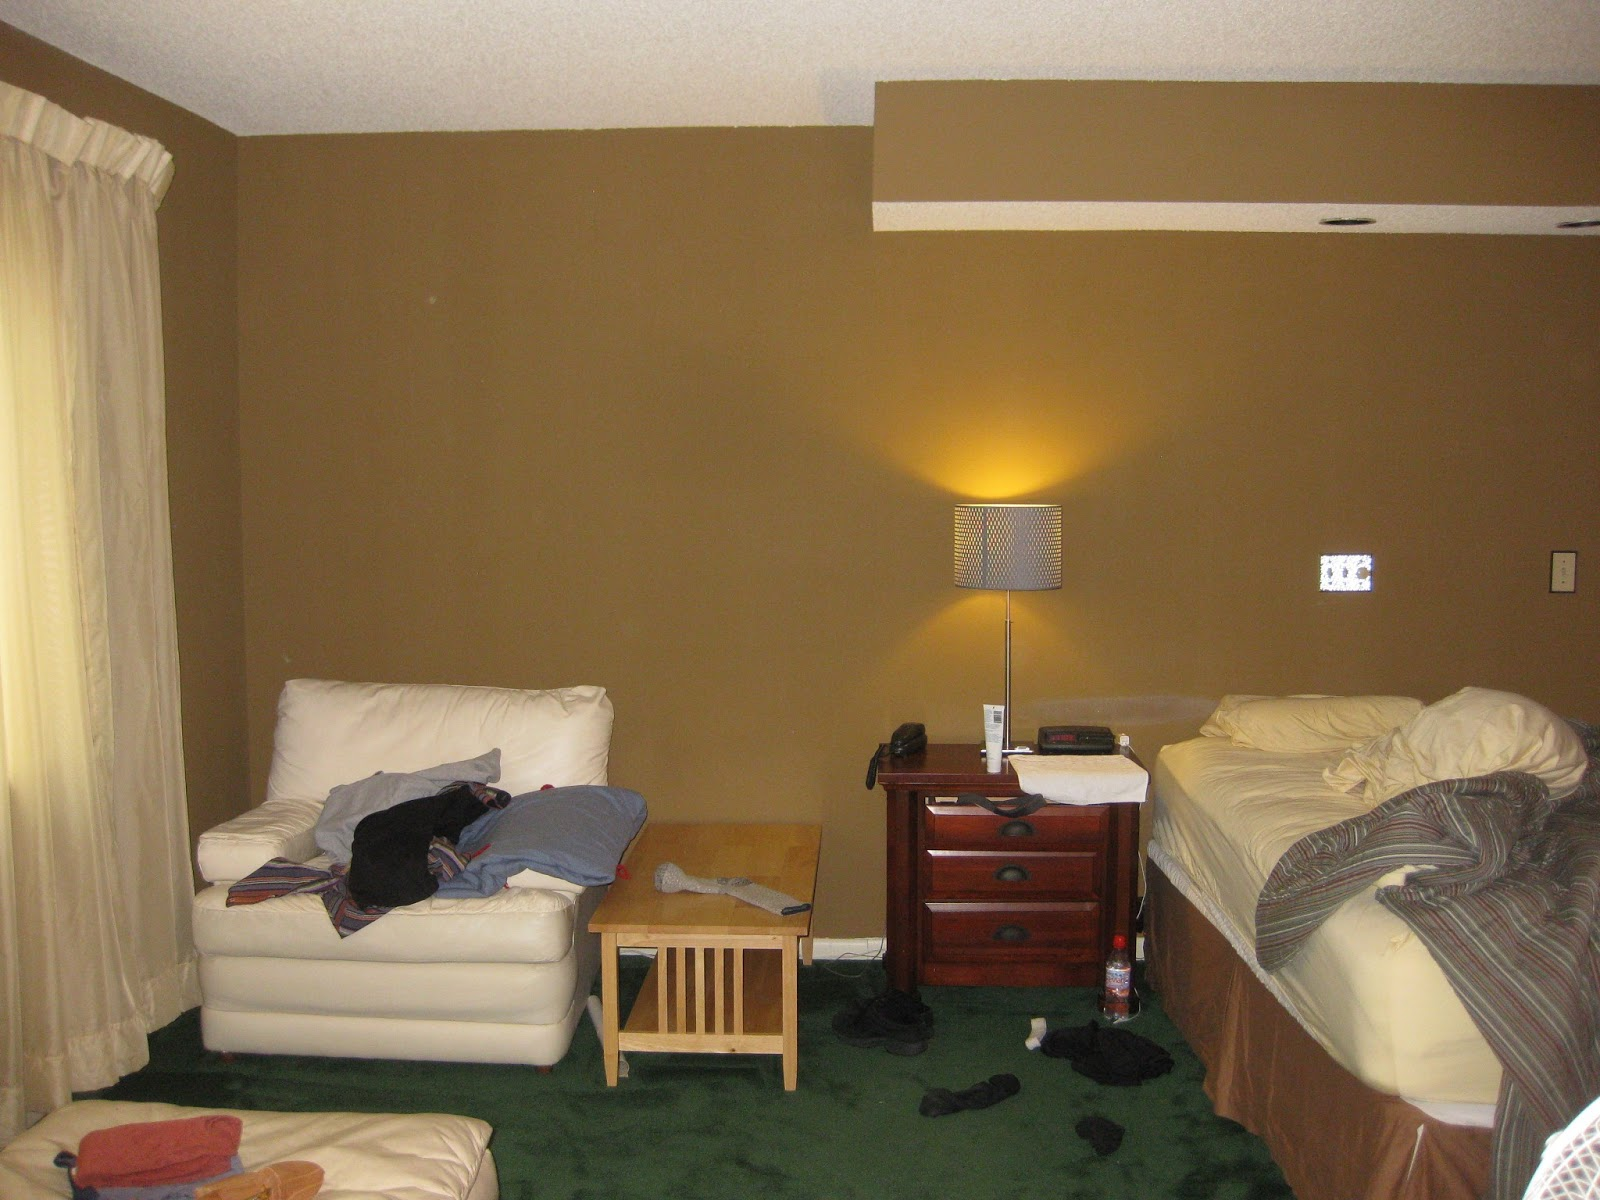 Decorating With Hunter Green Carpet | Decoratingspecial.com